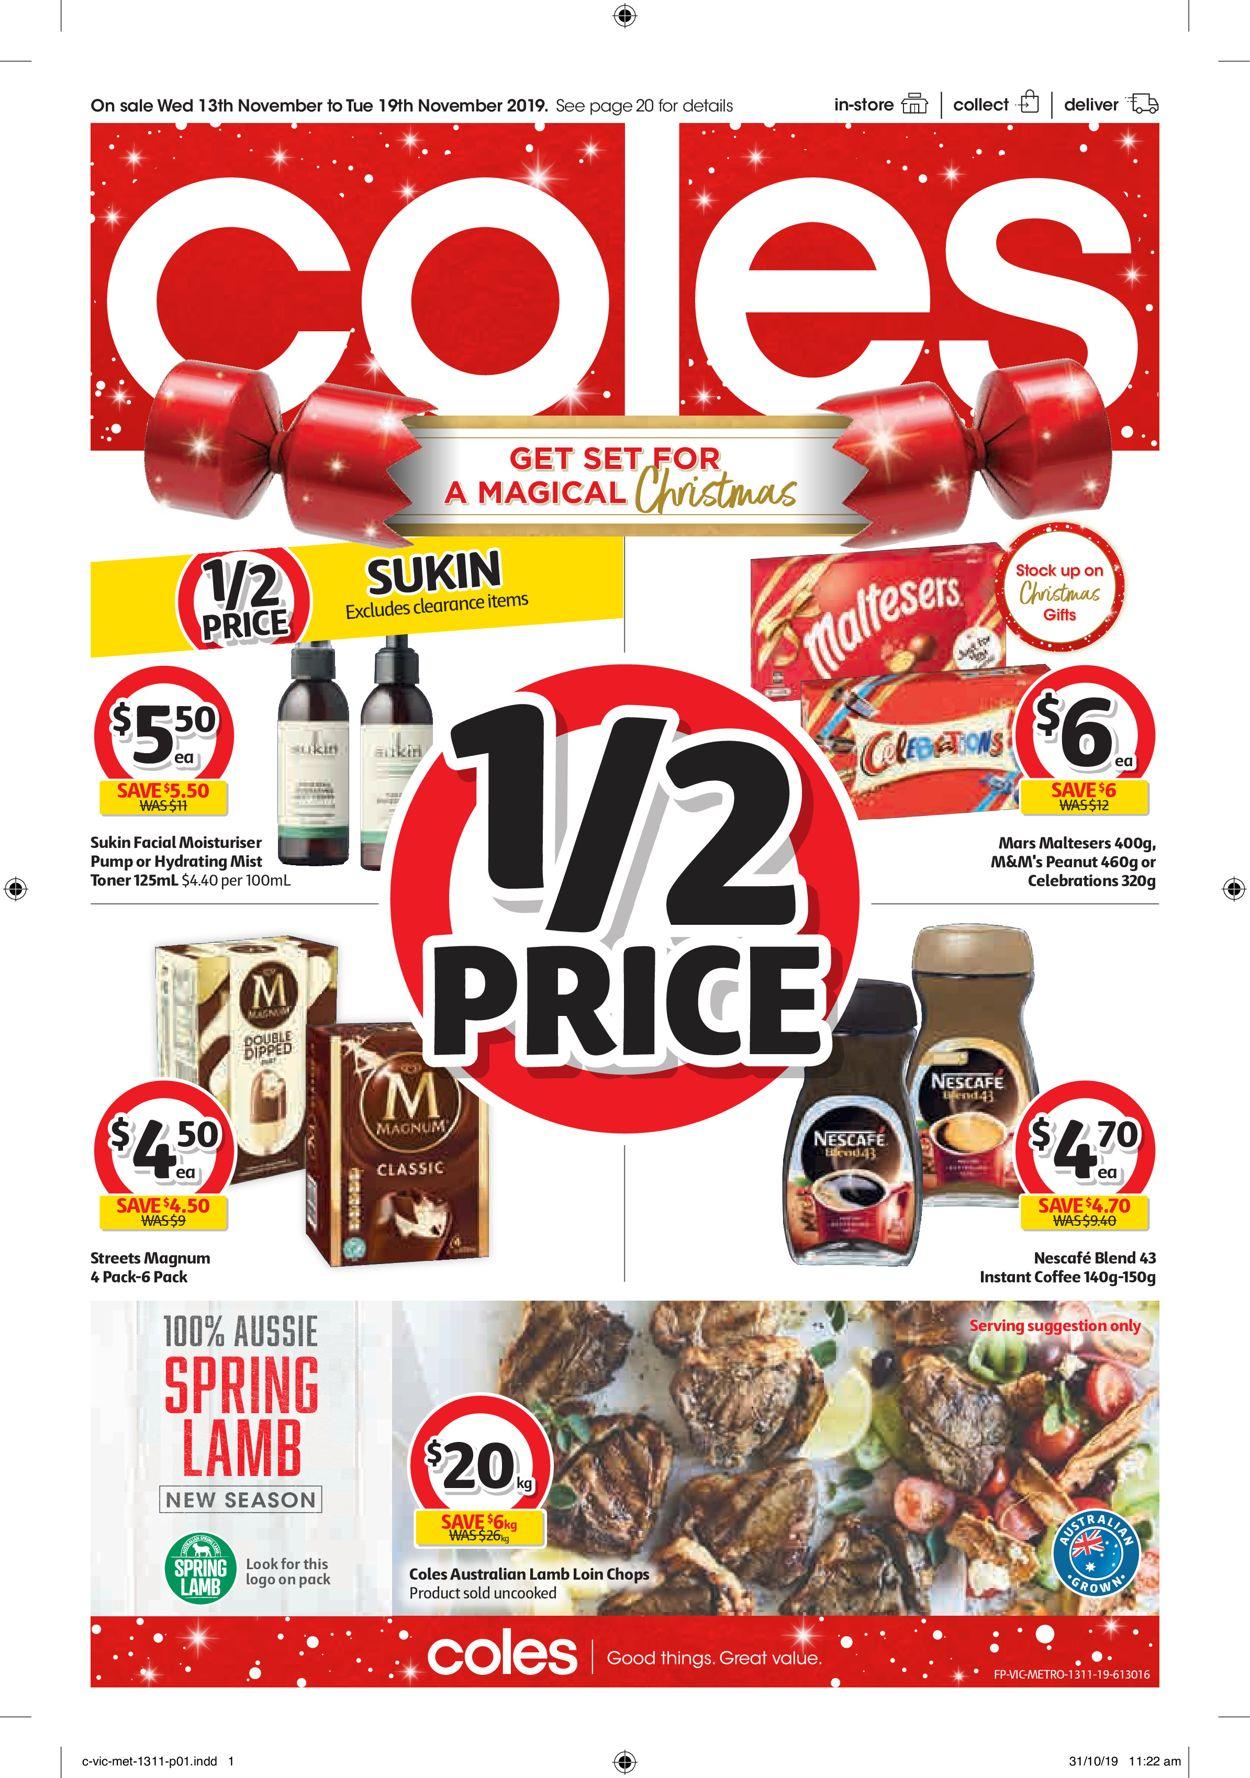 Coles Catalogue - 13/11-19/11/2019